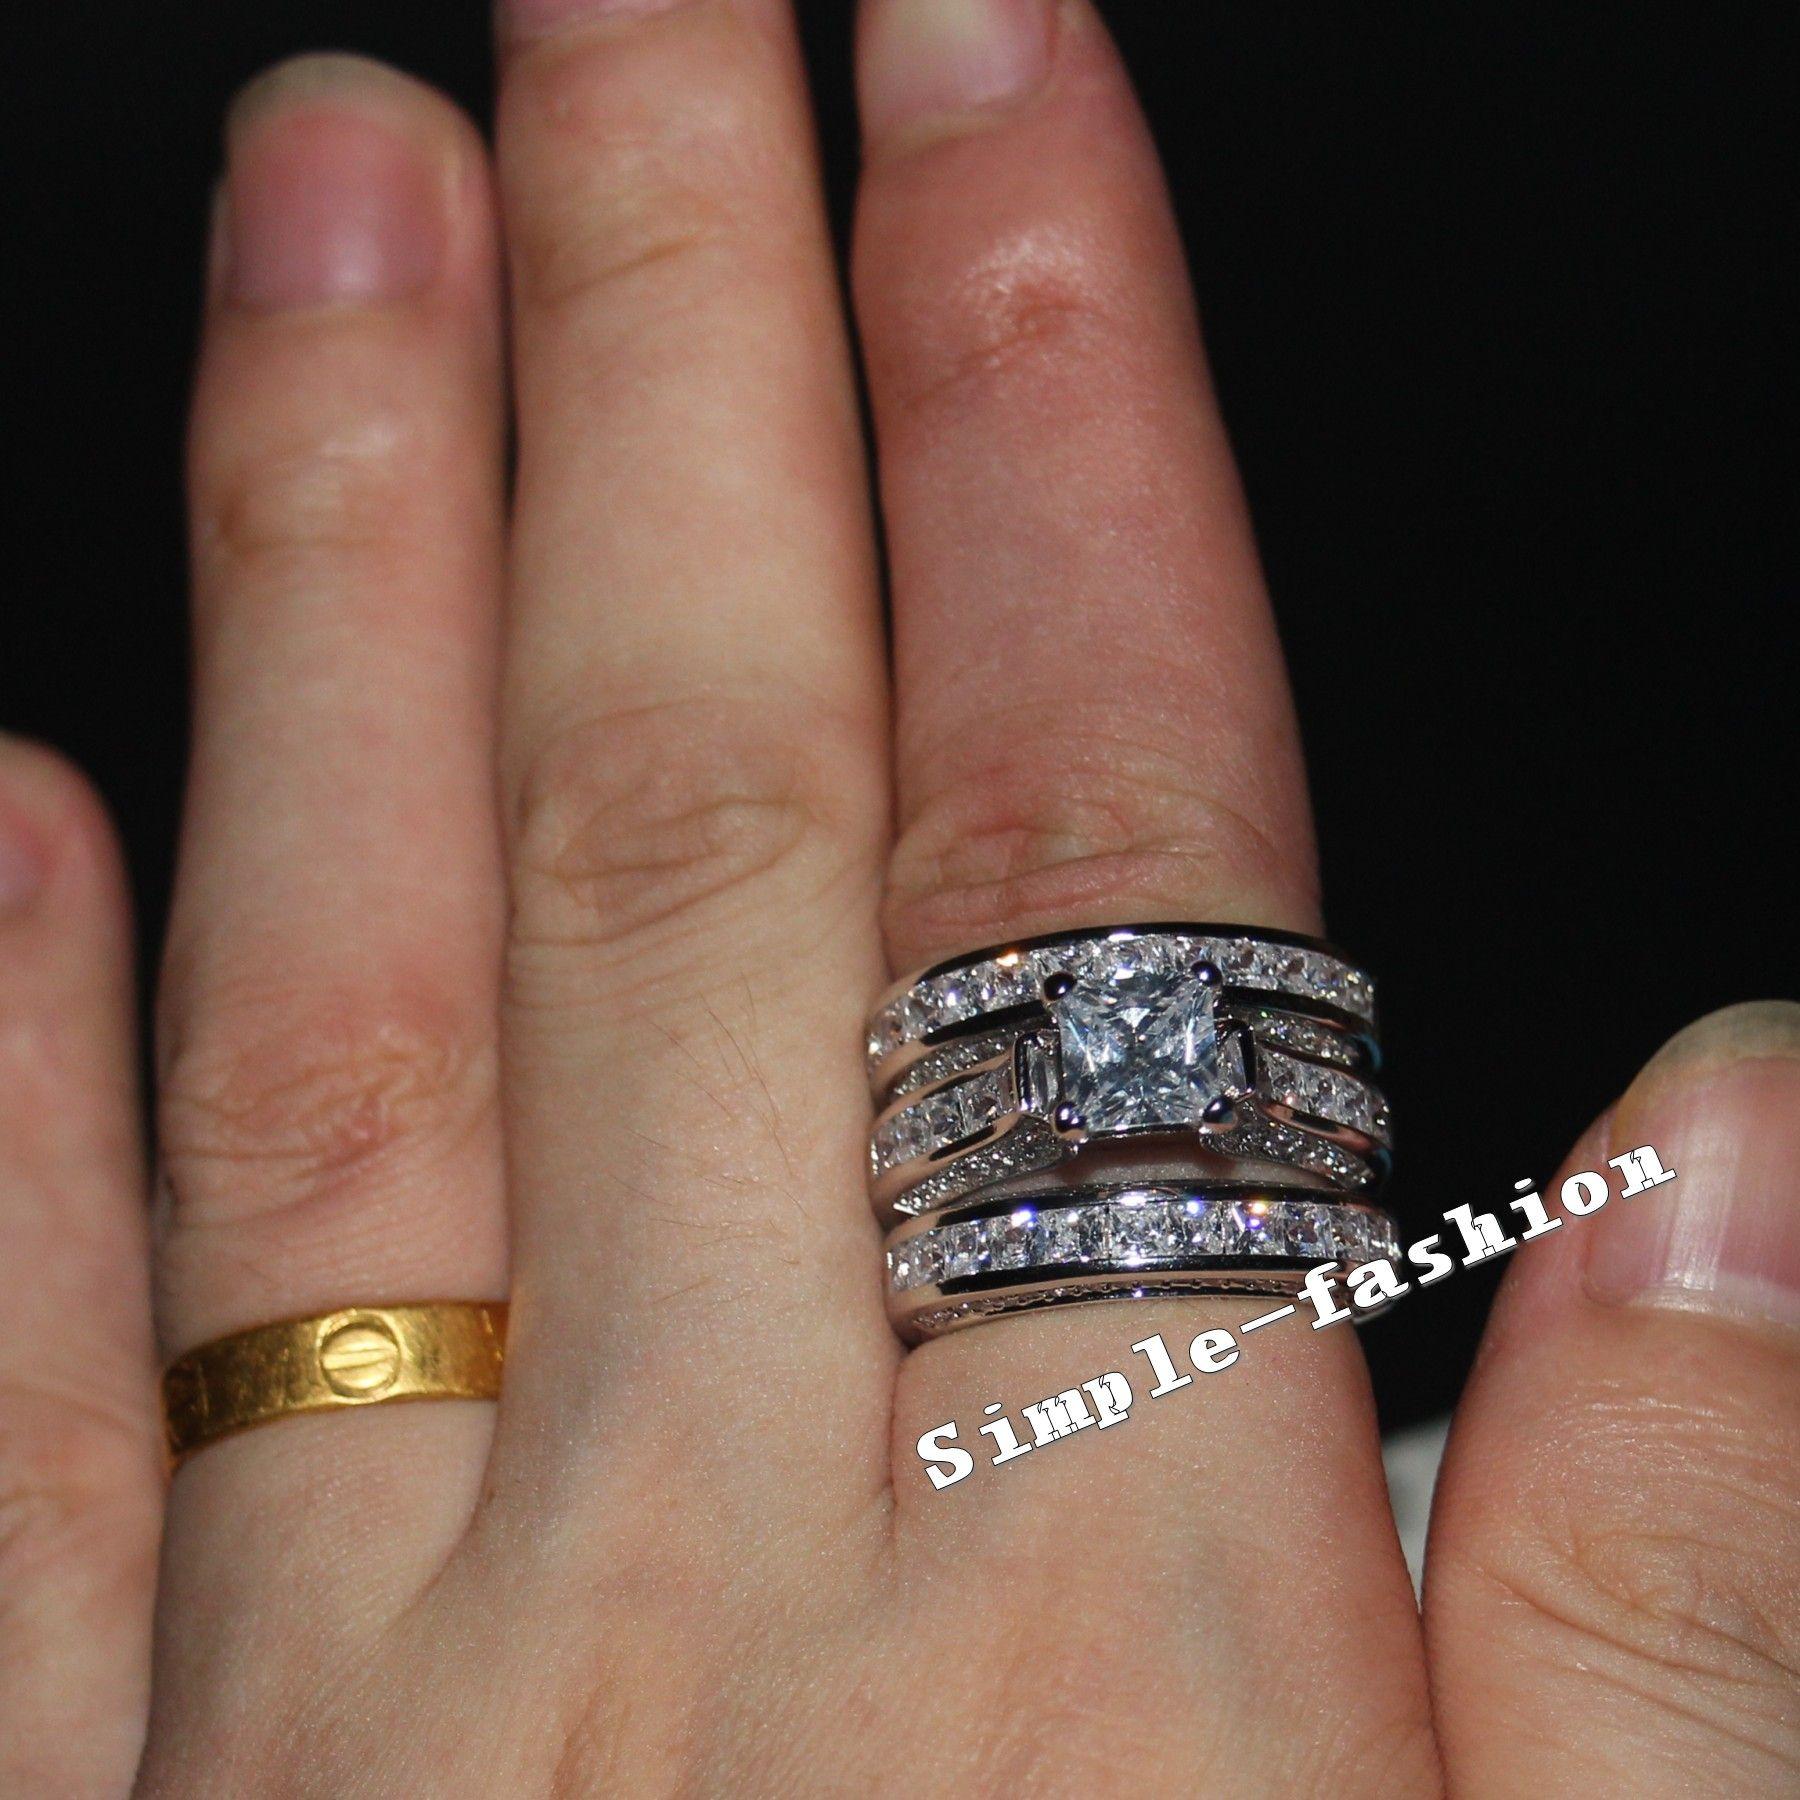 Vecalon Fine Jewelry Princesa corte 20ct Cz diamante Anel de Noivado Wedding Band Set para As Mulheres 14KT White Gold Filled dedo anelar